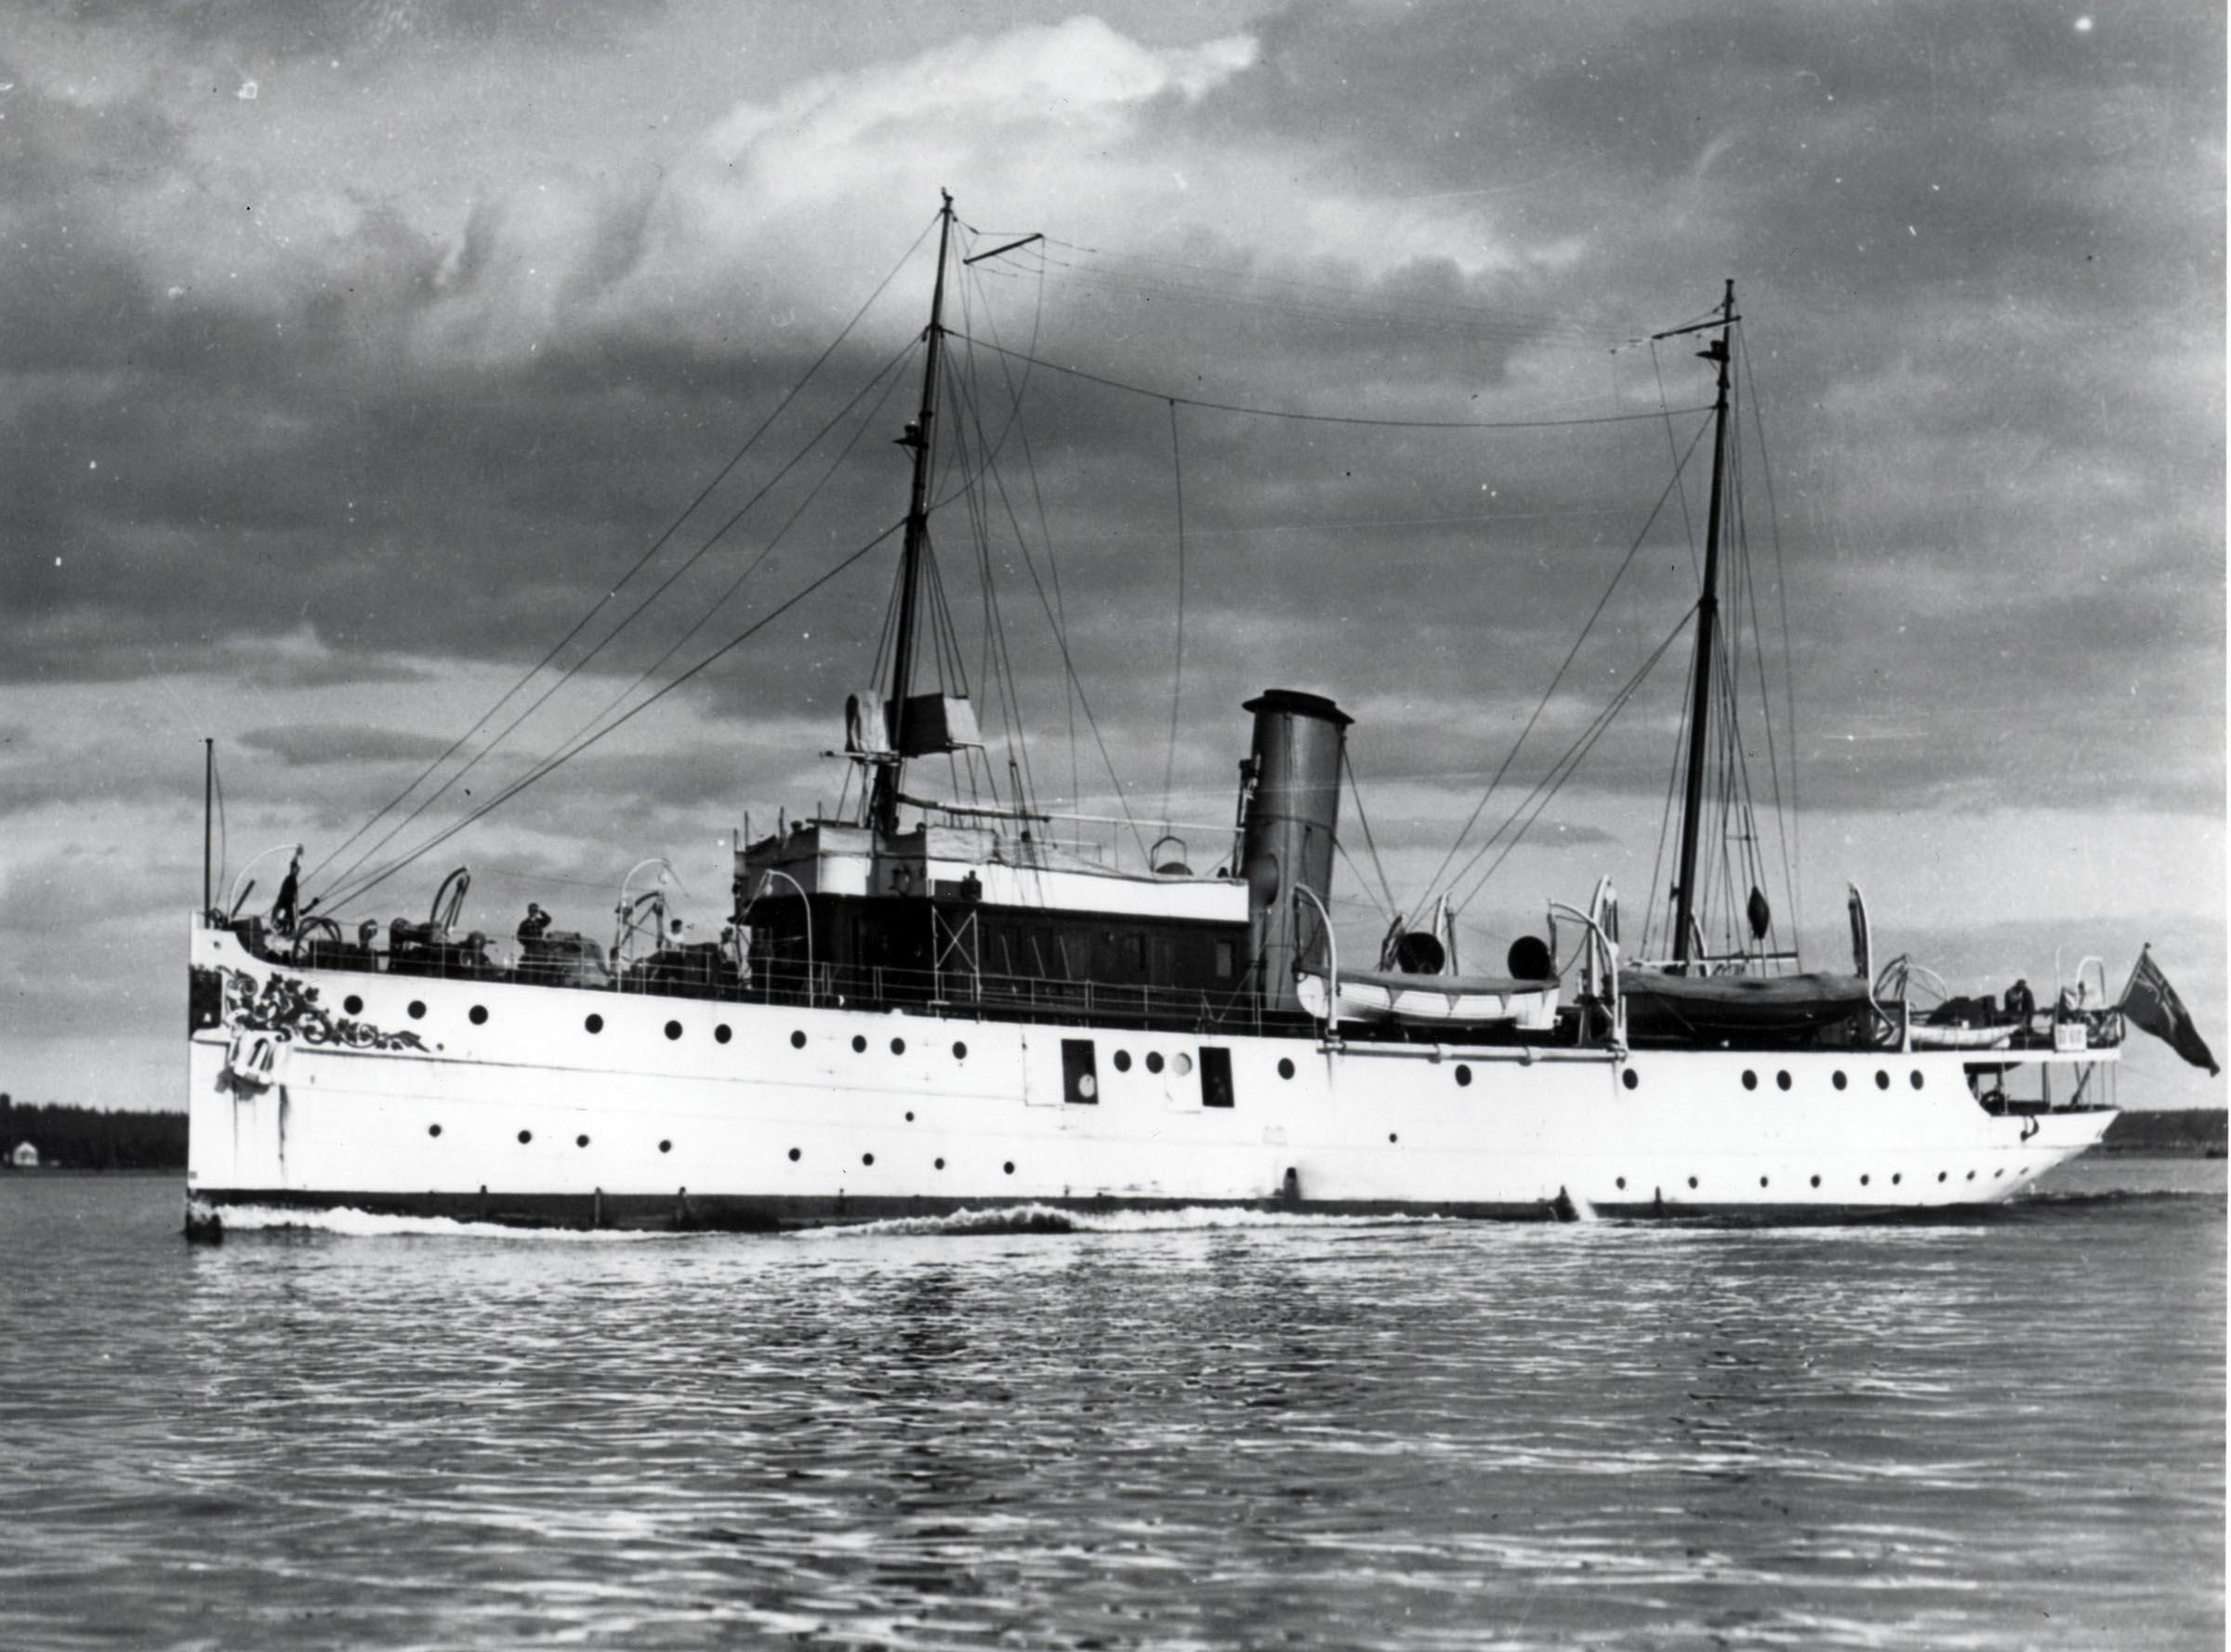 HMCS CARTIER